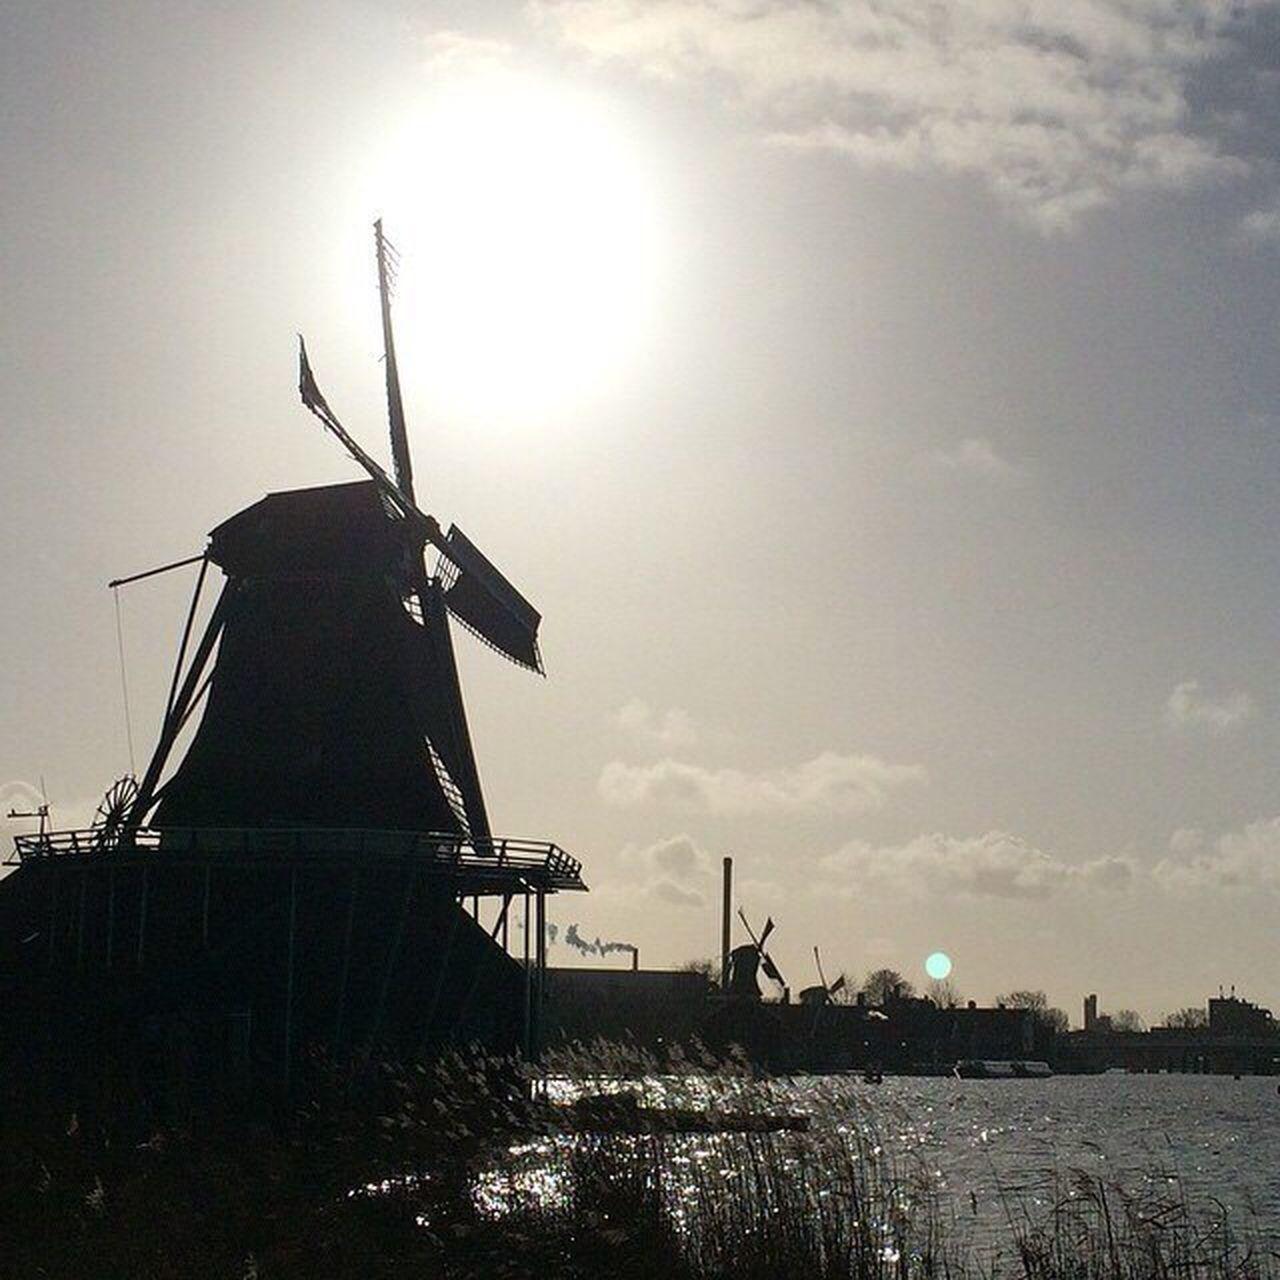 Alternative Energy Windmill Wind Power Wind Turbine Traditional Windmill First Eyeem Photo Travel Holland Windmills Village